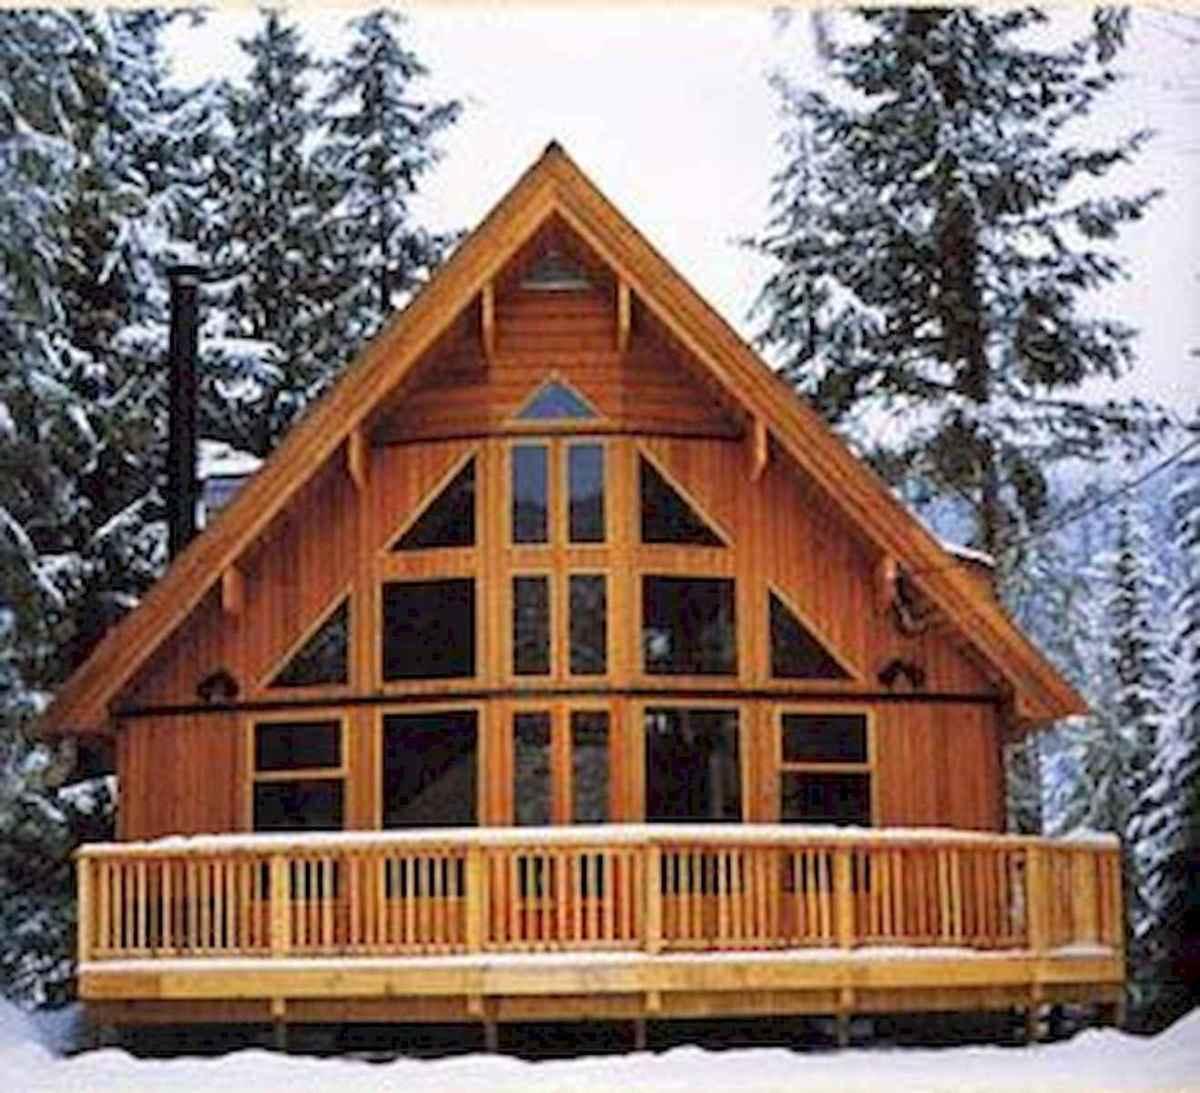 75 Great Log Cabin Homes Plans Design Ideas (2)